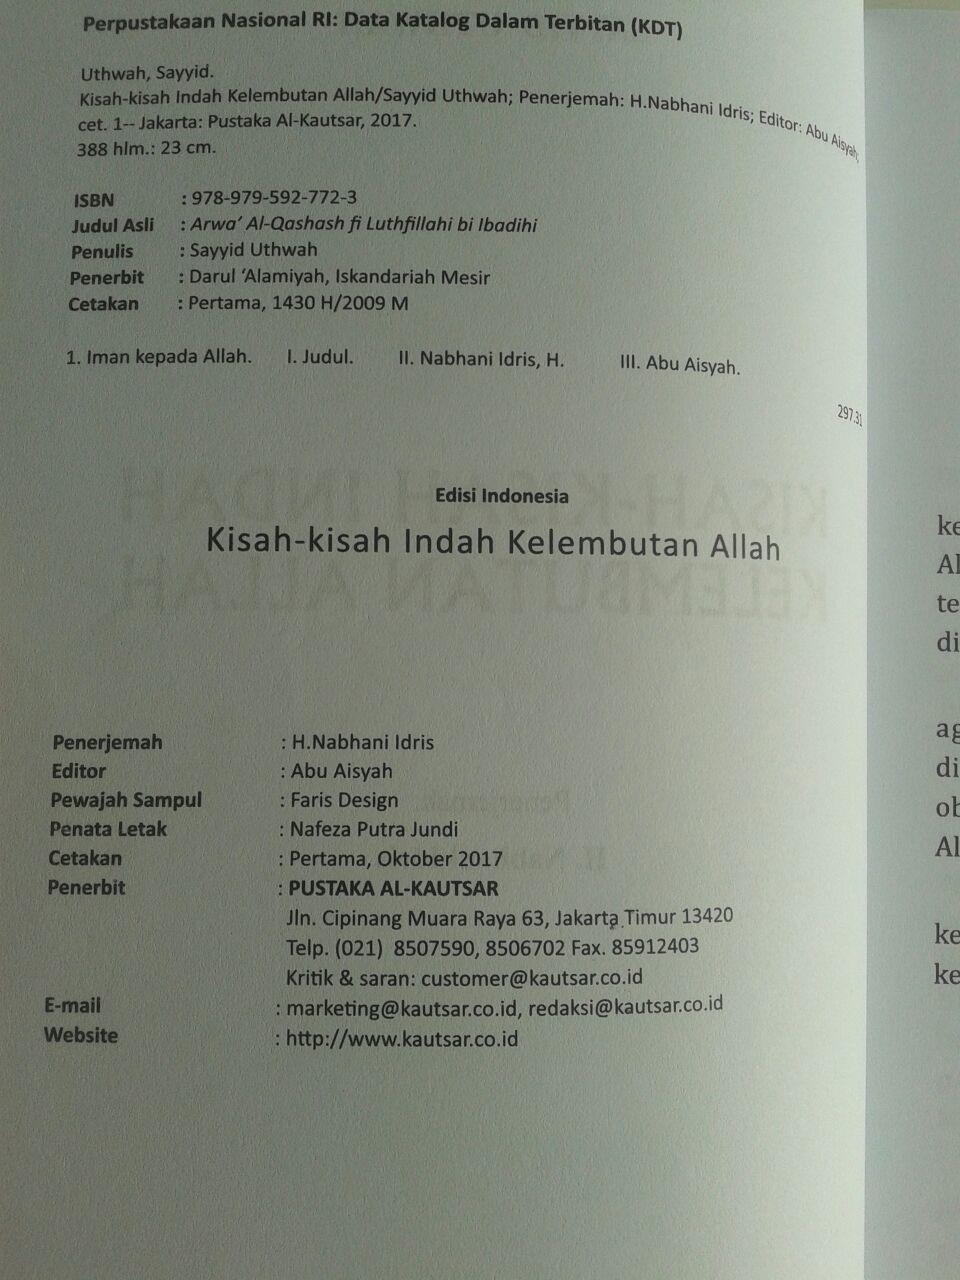 Buku Kisah-Kisah Indah Kelembutan Allah Pustaka Al-Kautsar Sayyid Uthwah isi